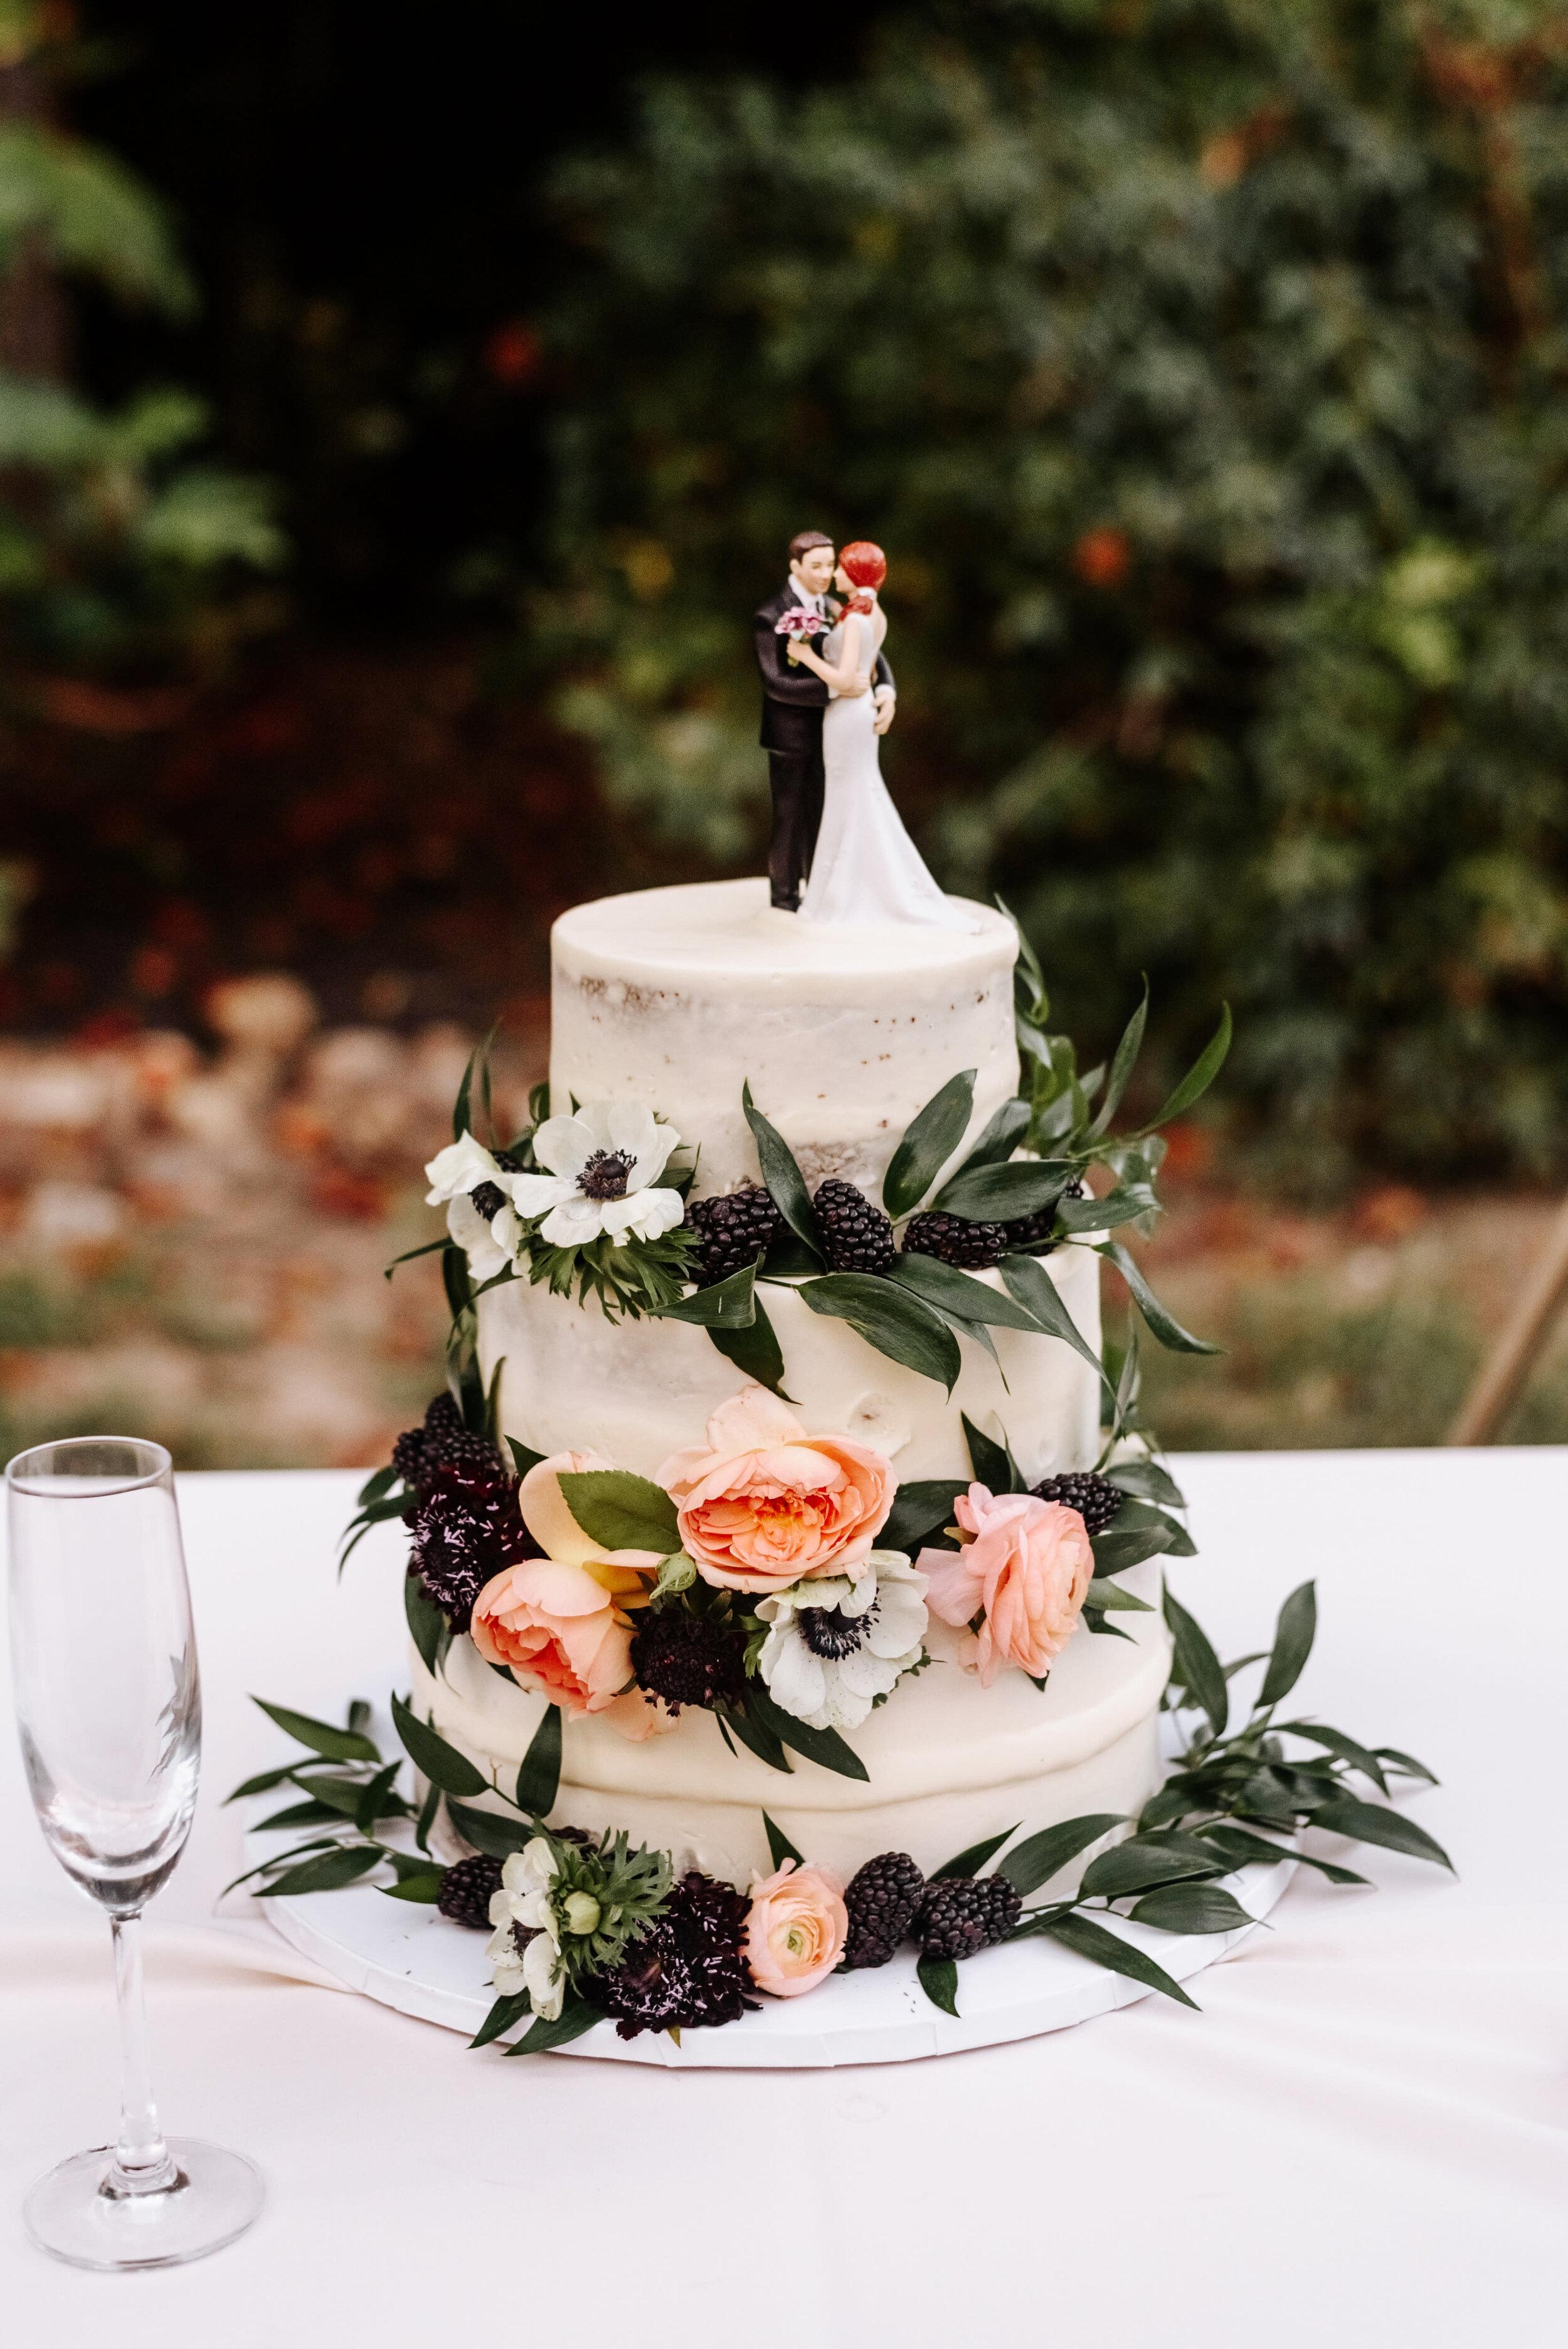 Rachel_David_Wedding_Richmond_Virginia_Photography_by_V_62.jpg